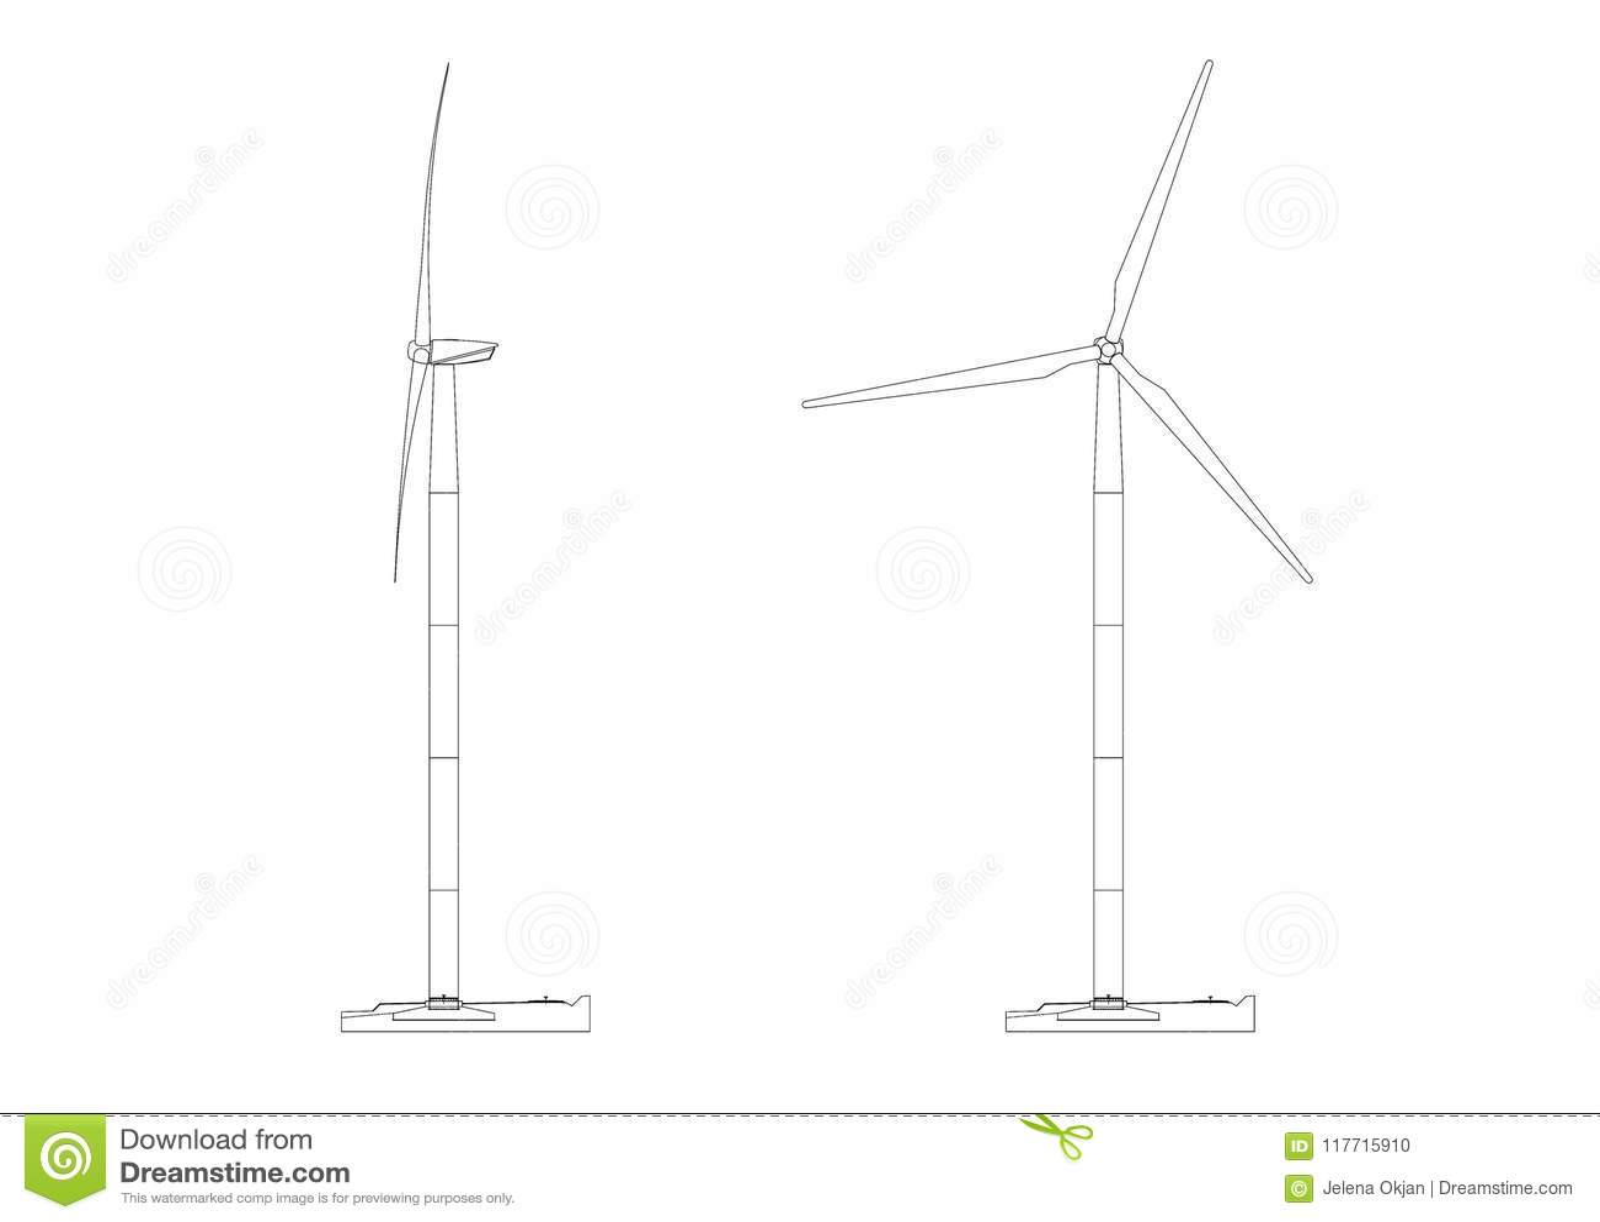 hight resolution of shoot of the wind turbine architect blueprint isolated